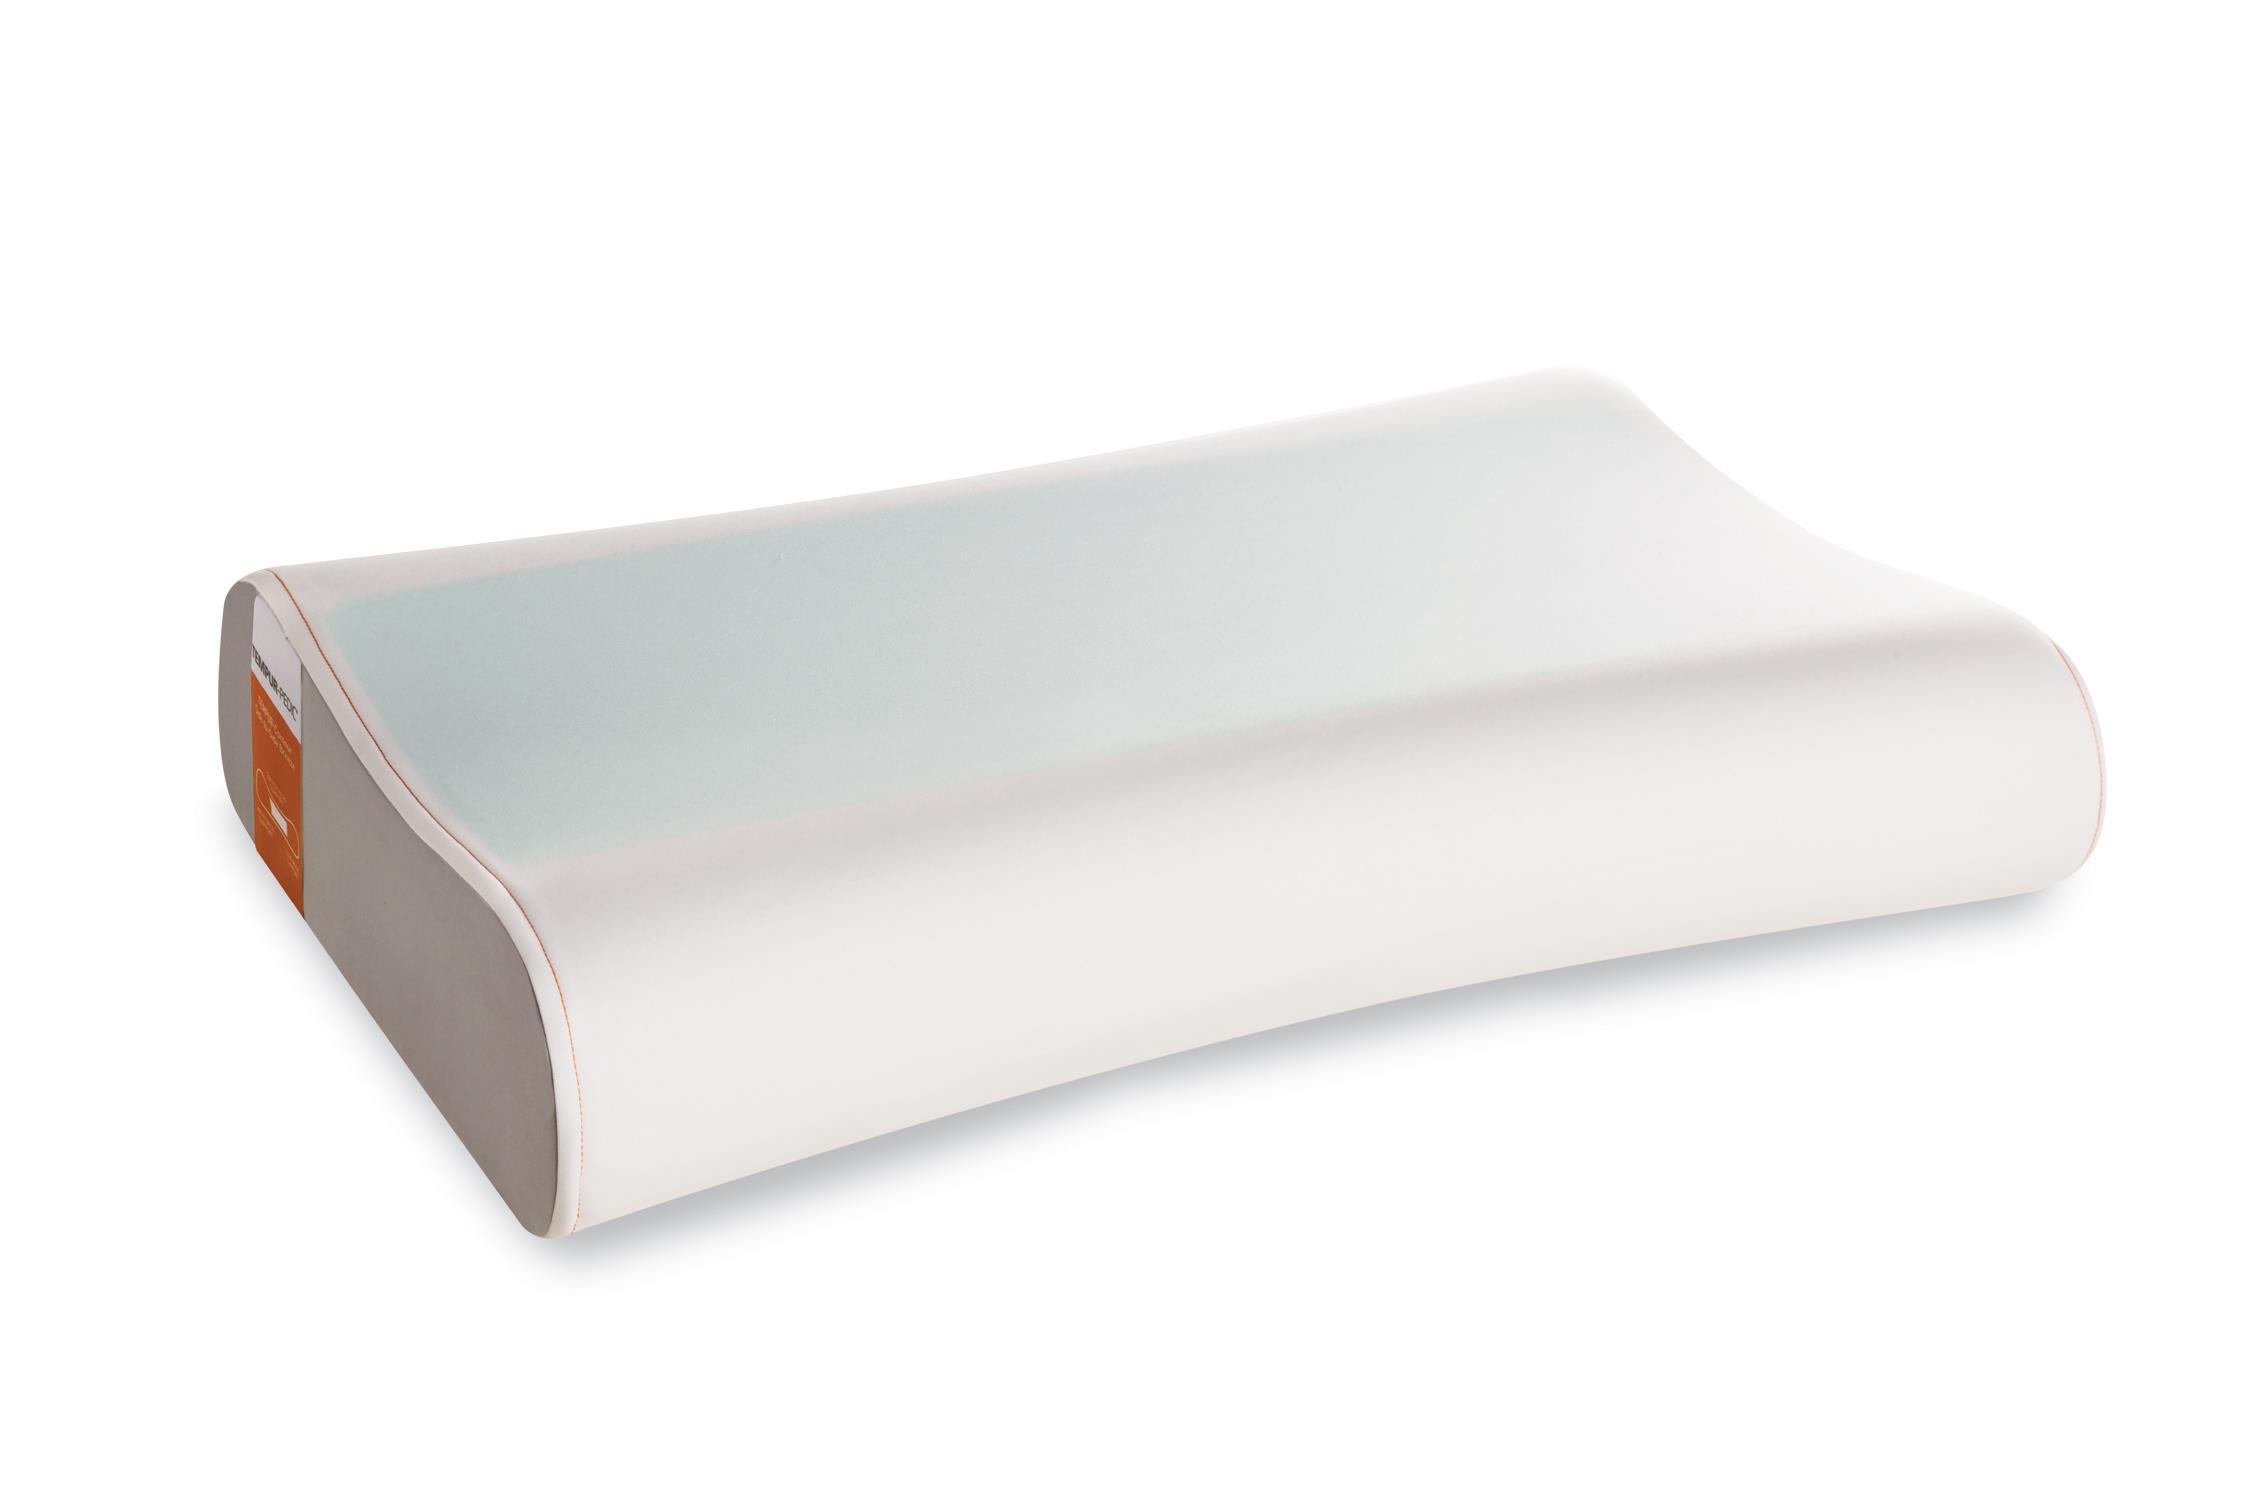 tempur pedic tempur pillows 15453115 tempur contour. Black Bedroom Furniture Sets. Home Design Ideas